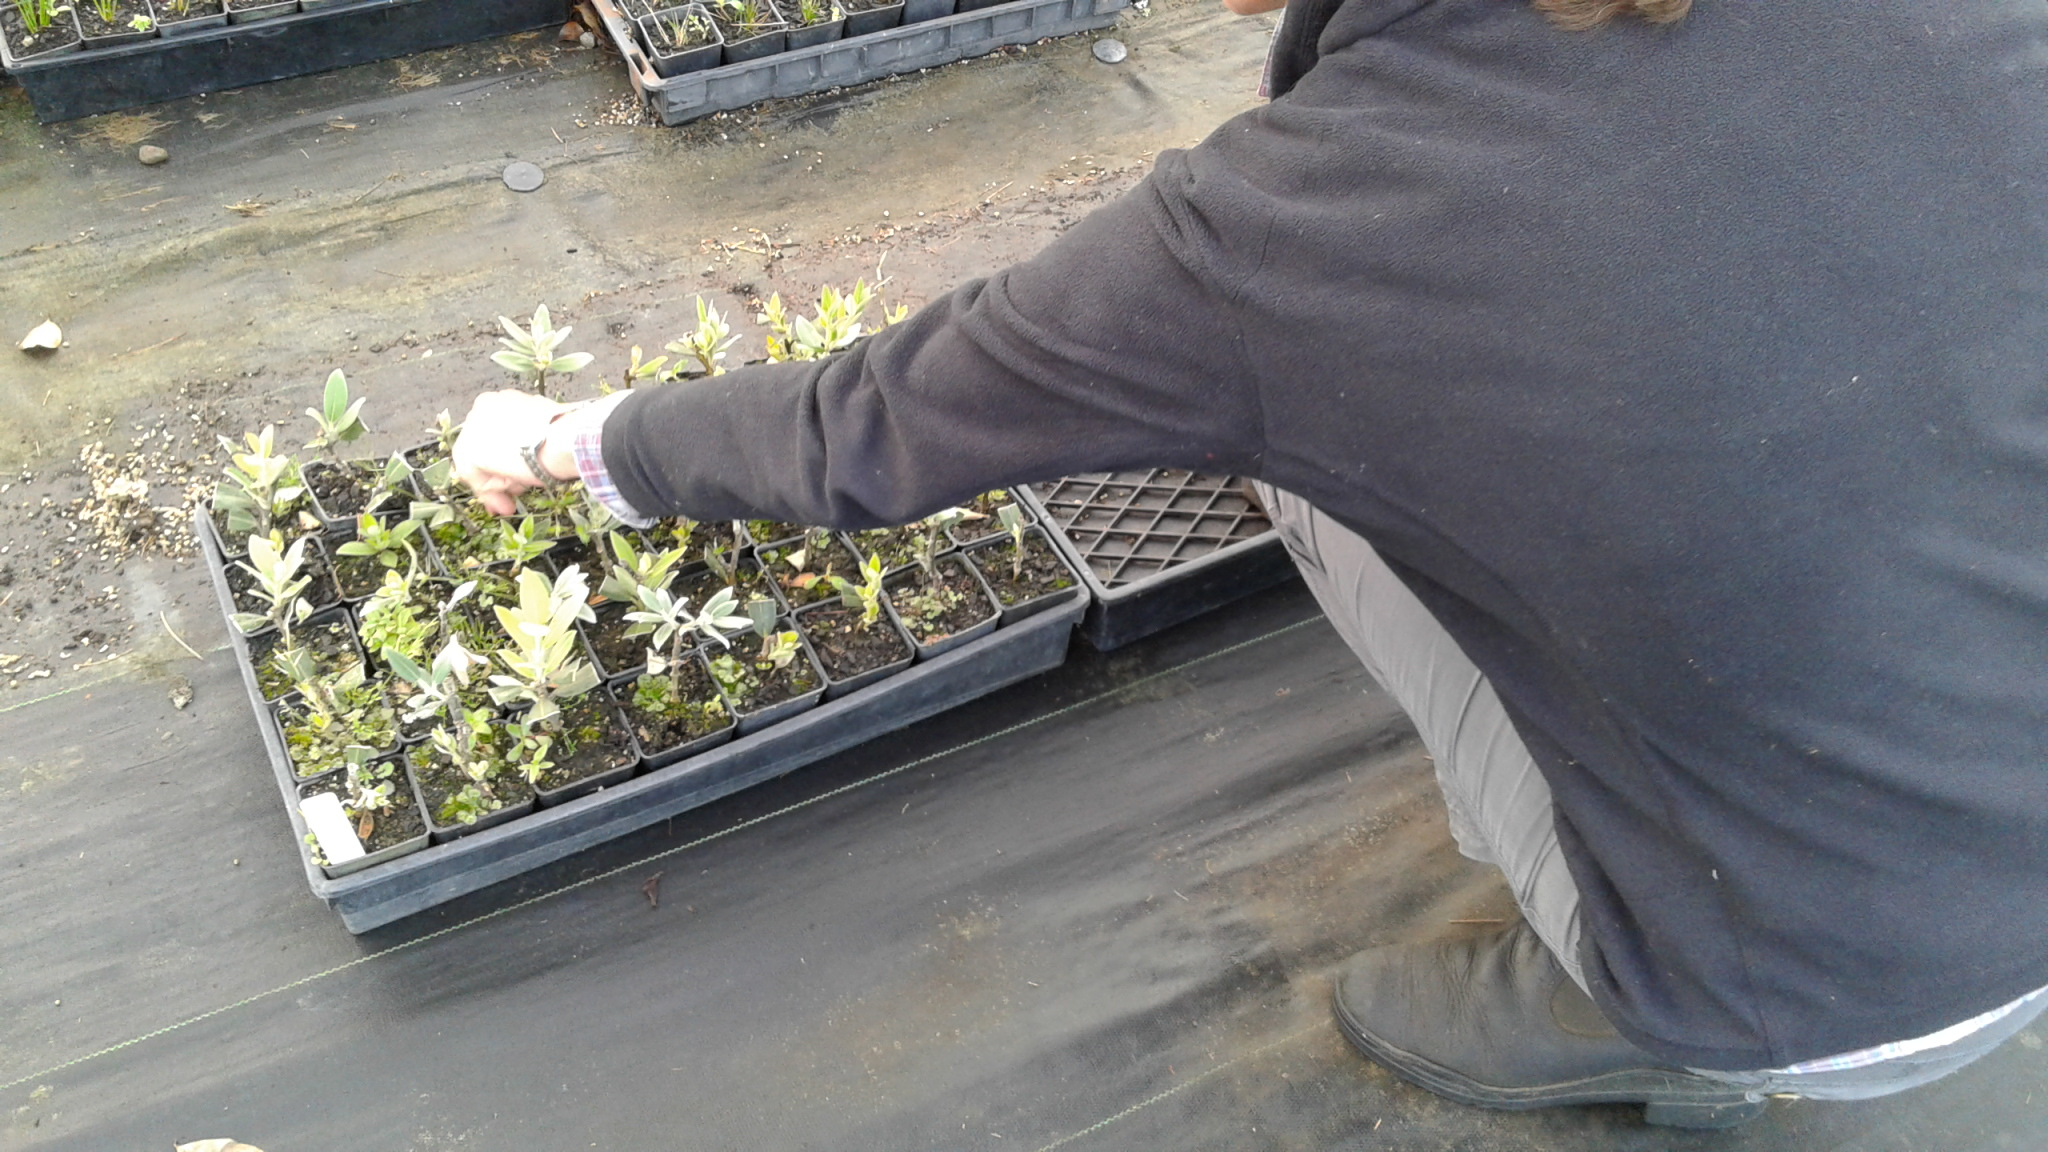 Julia shows off her Pohutakawa cuttings, grown at IDEA Services Atawhai plant nursery near New Plymouth.